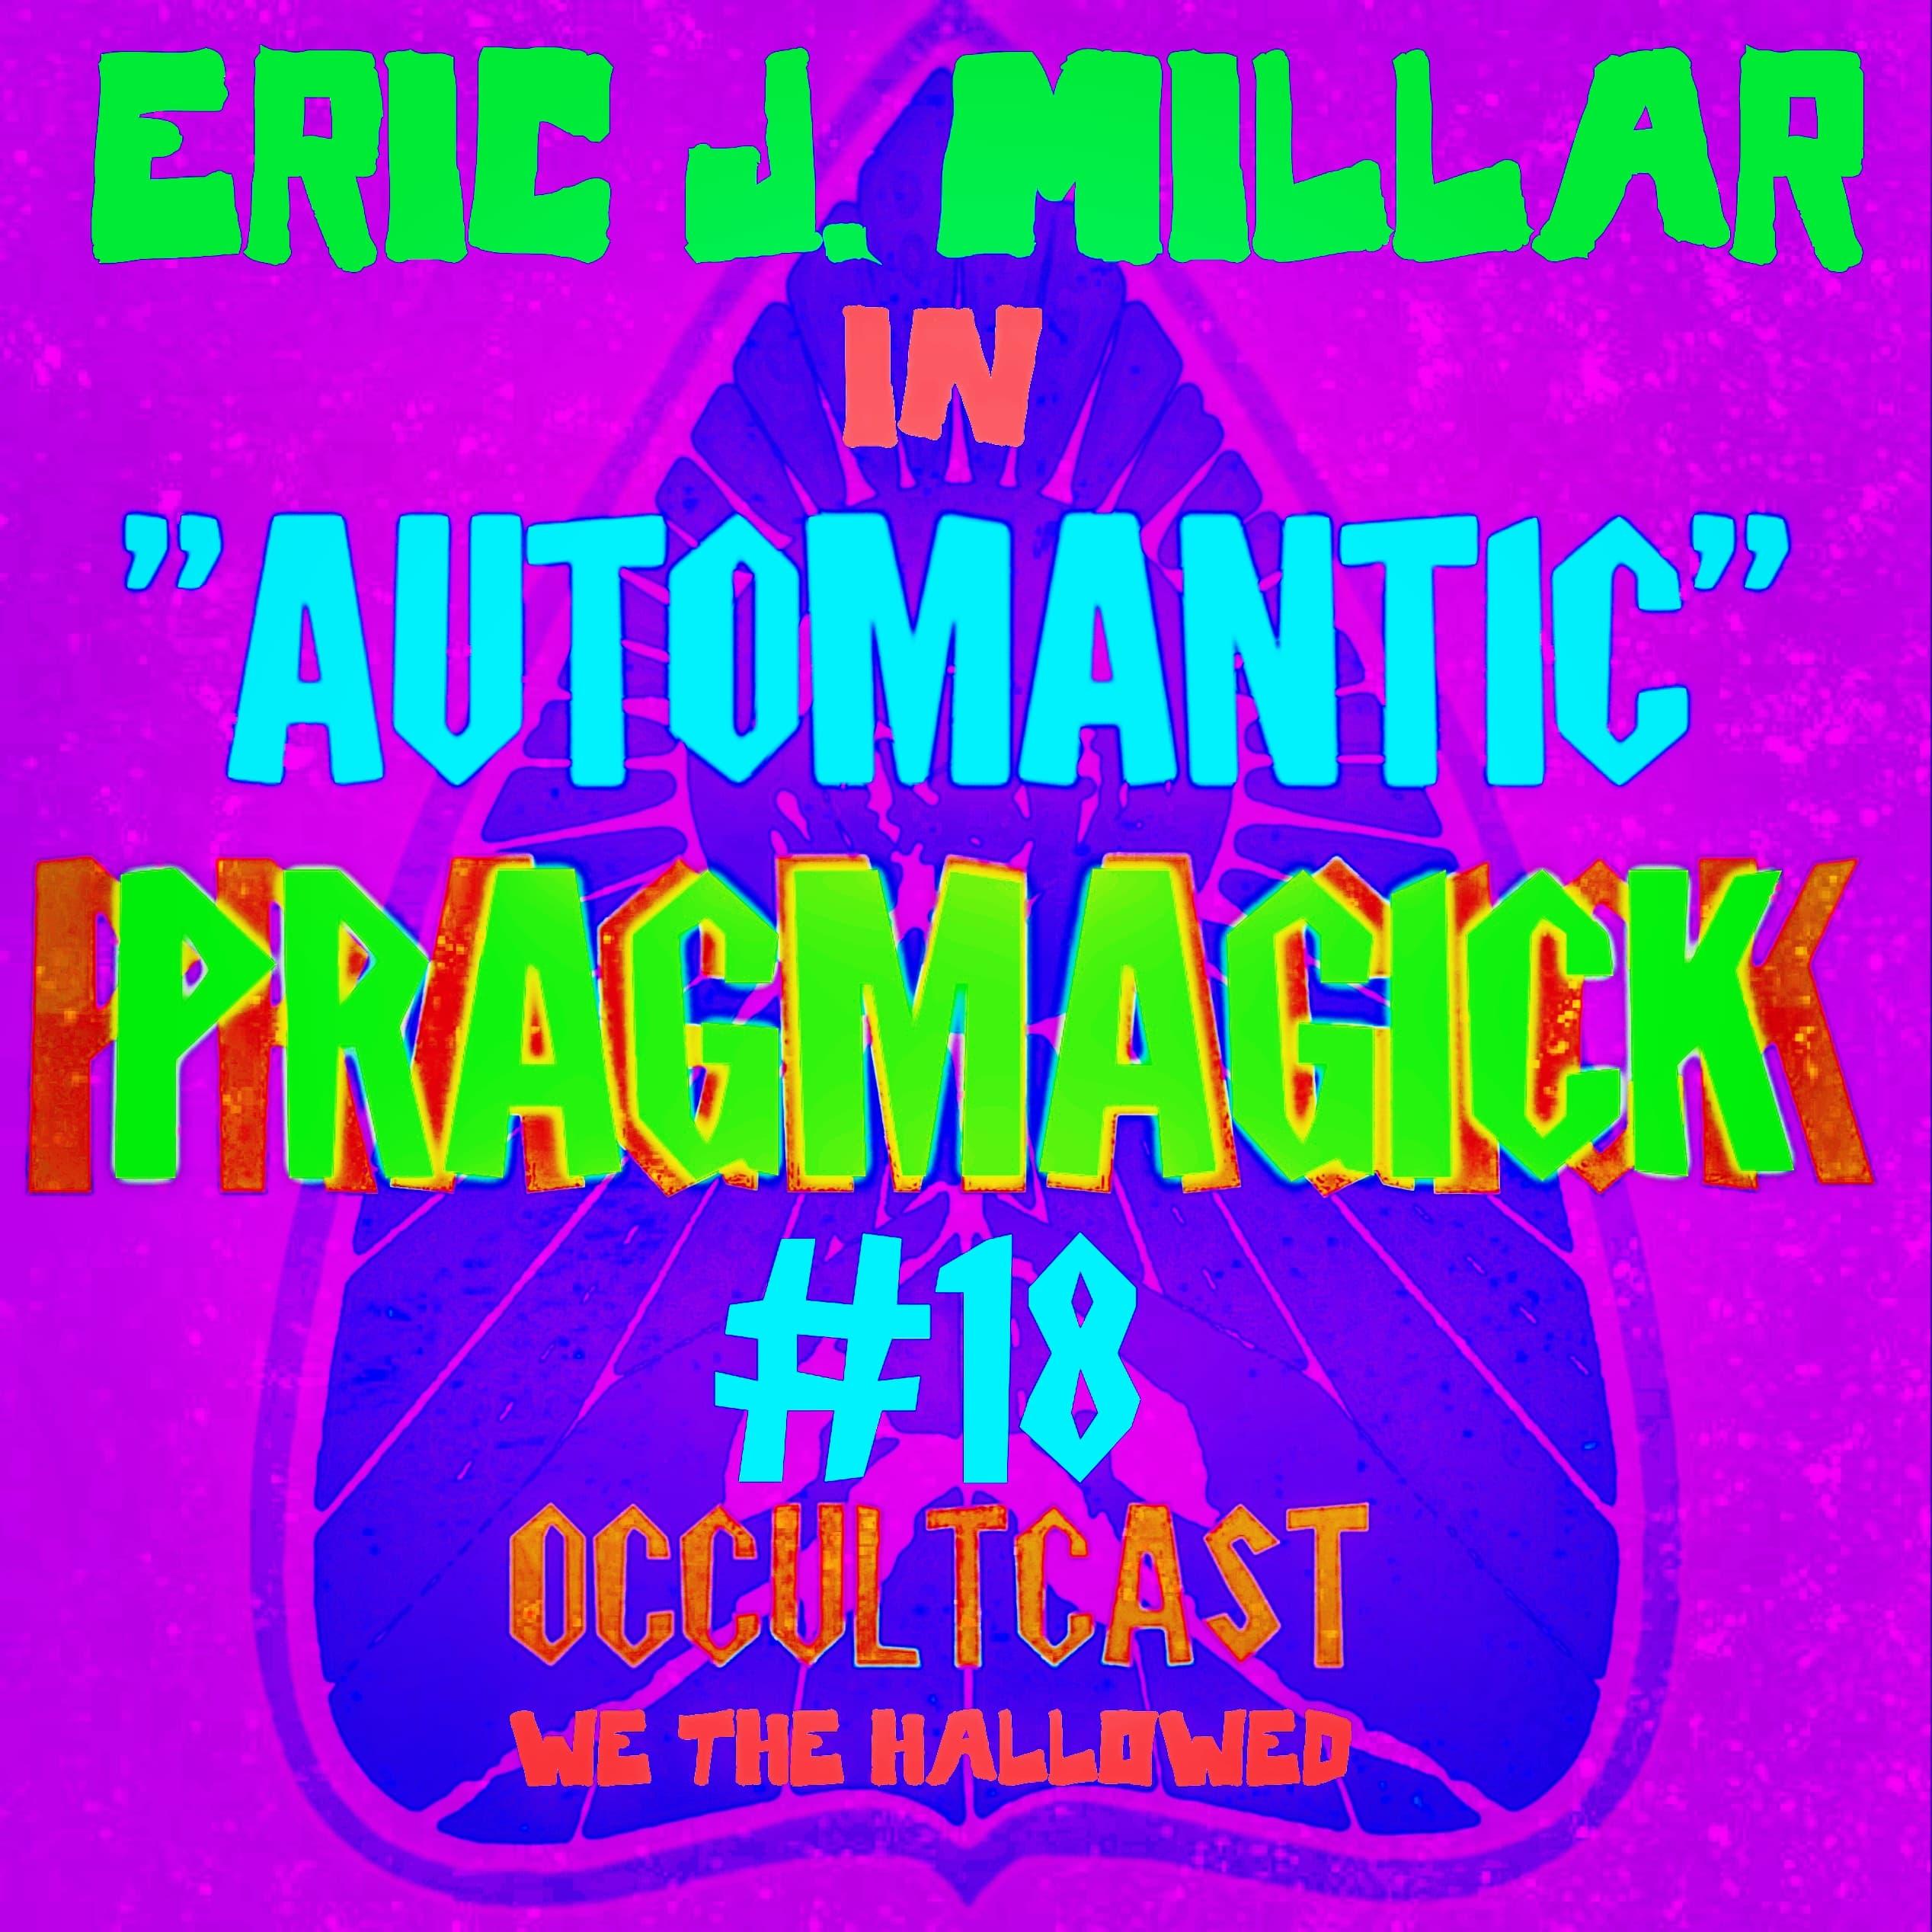 """AUTOMANTIC"" w/ Eric J. Millar (Outlet Press) in PRAGMAGICK #18"